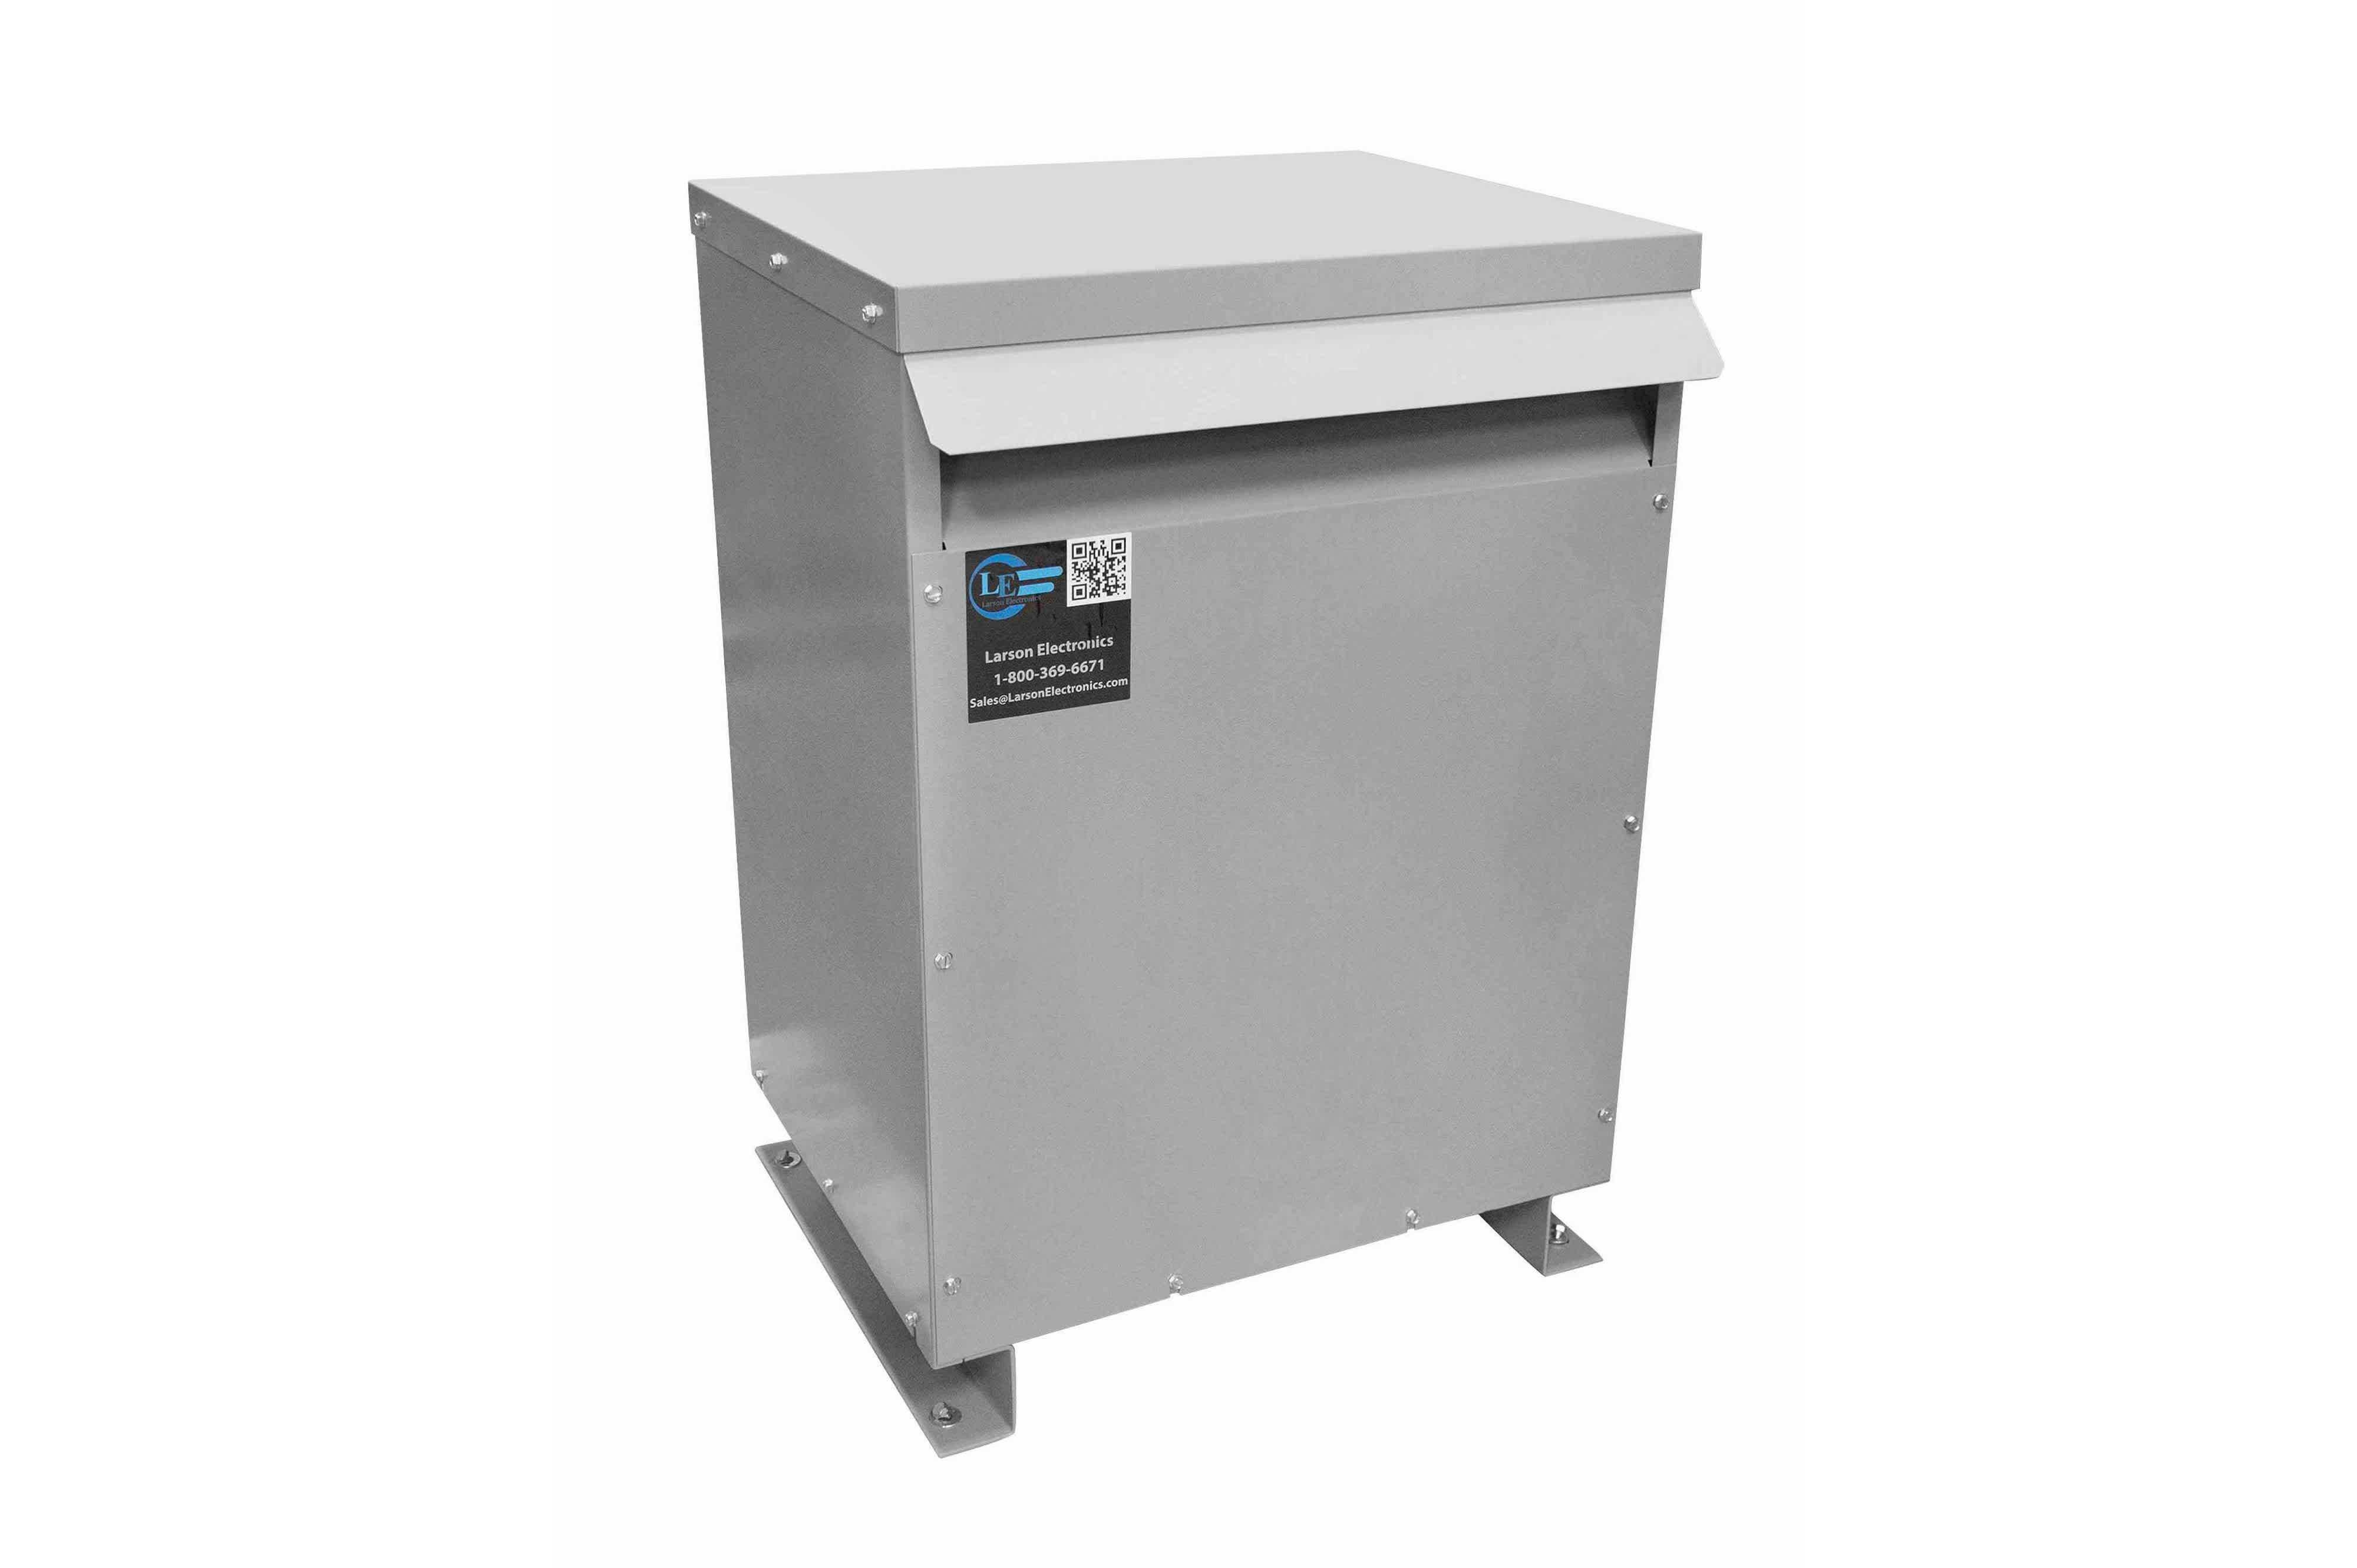 600 kVA 3PH Isolation Transformer, 220V Wye Primary, 208Y/120 Wye-N Secondary, N3R, Ventilated, 60 Hz